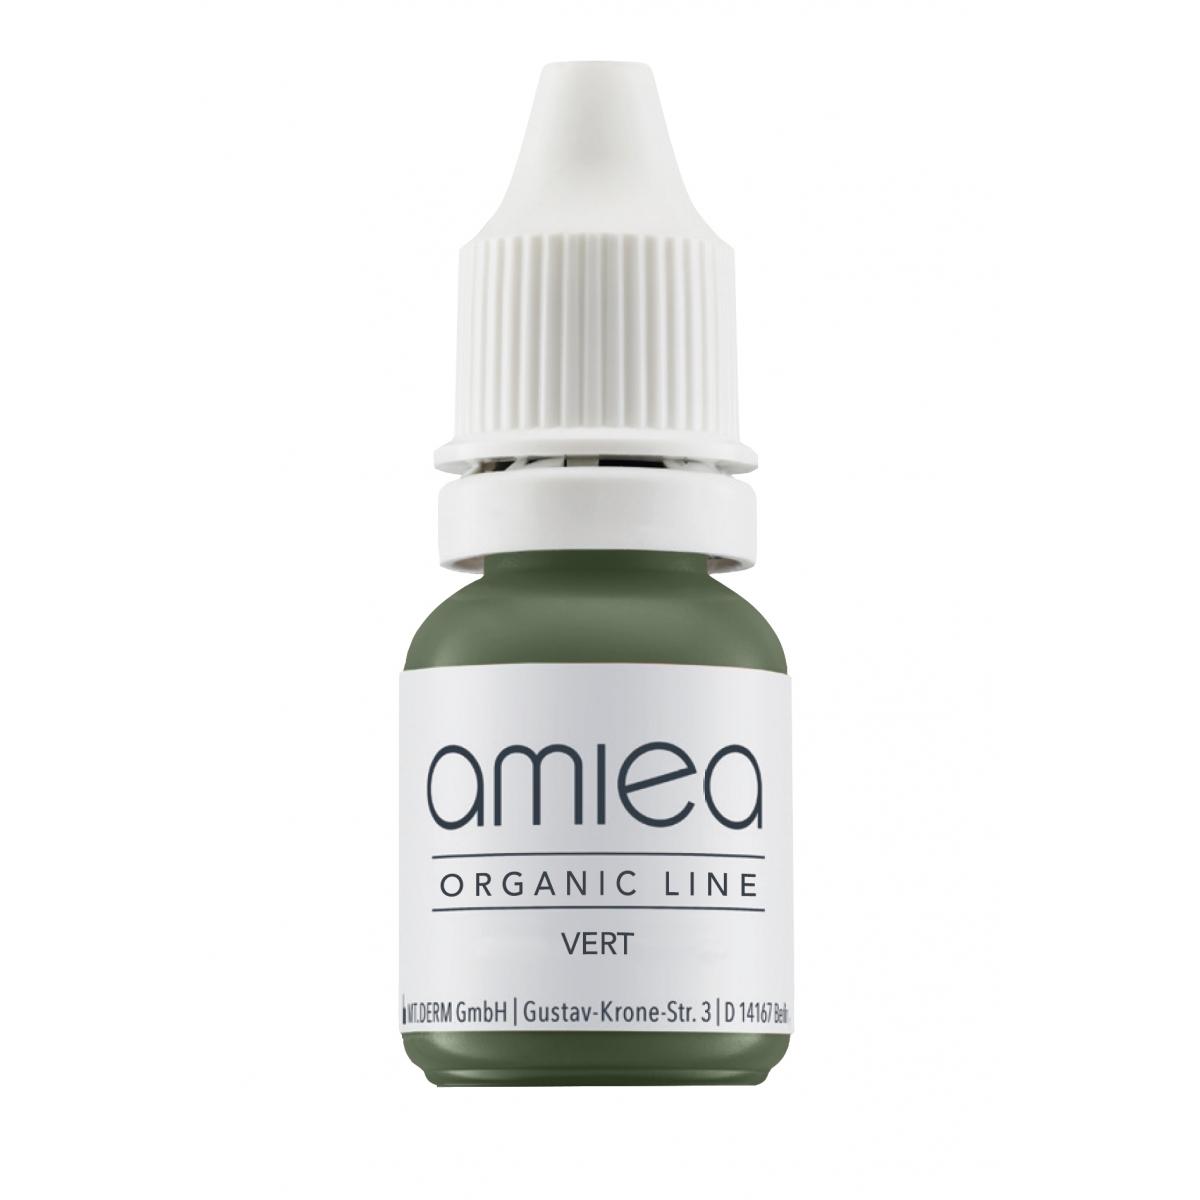 ORGANIC LINE (10ml) - PIGMENT CORRECTEUR VERT ORGANICLINE AMIEA (10 ml)